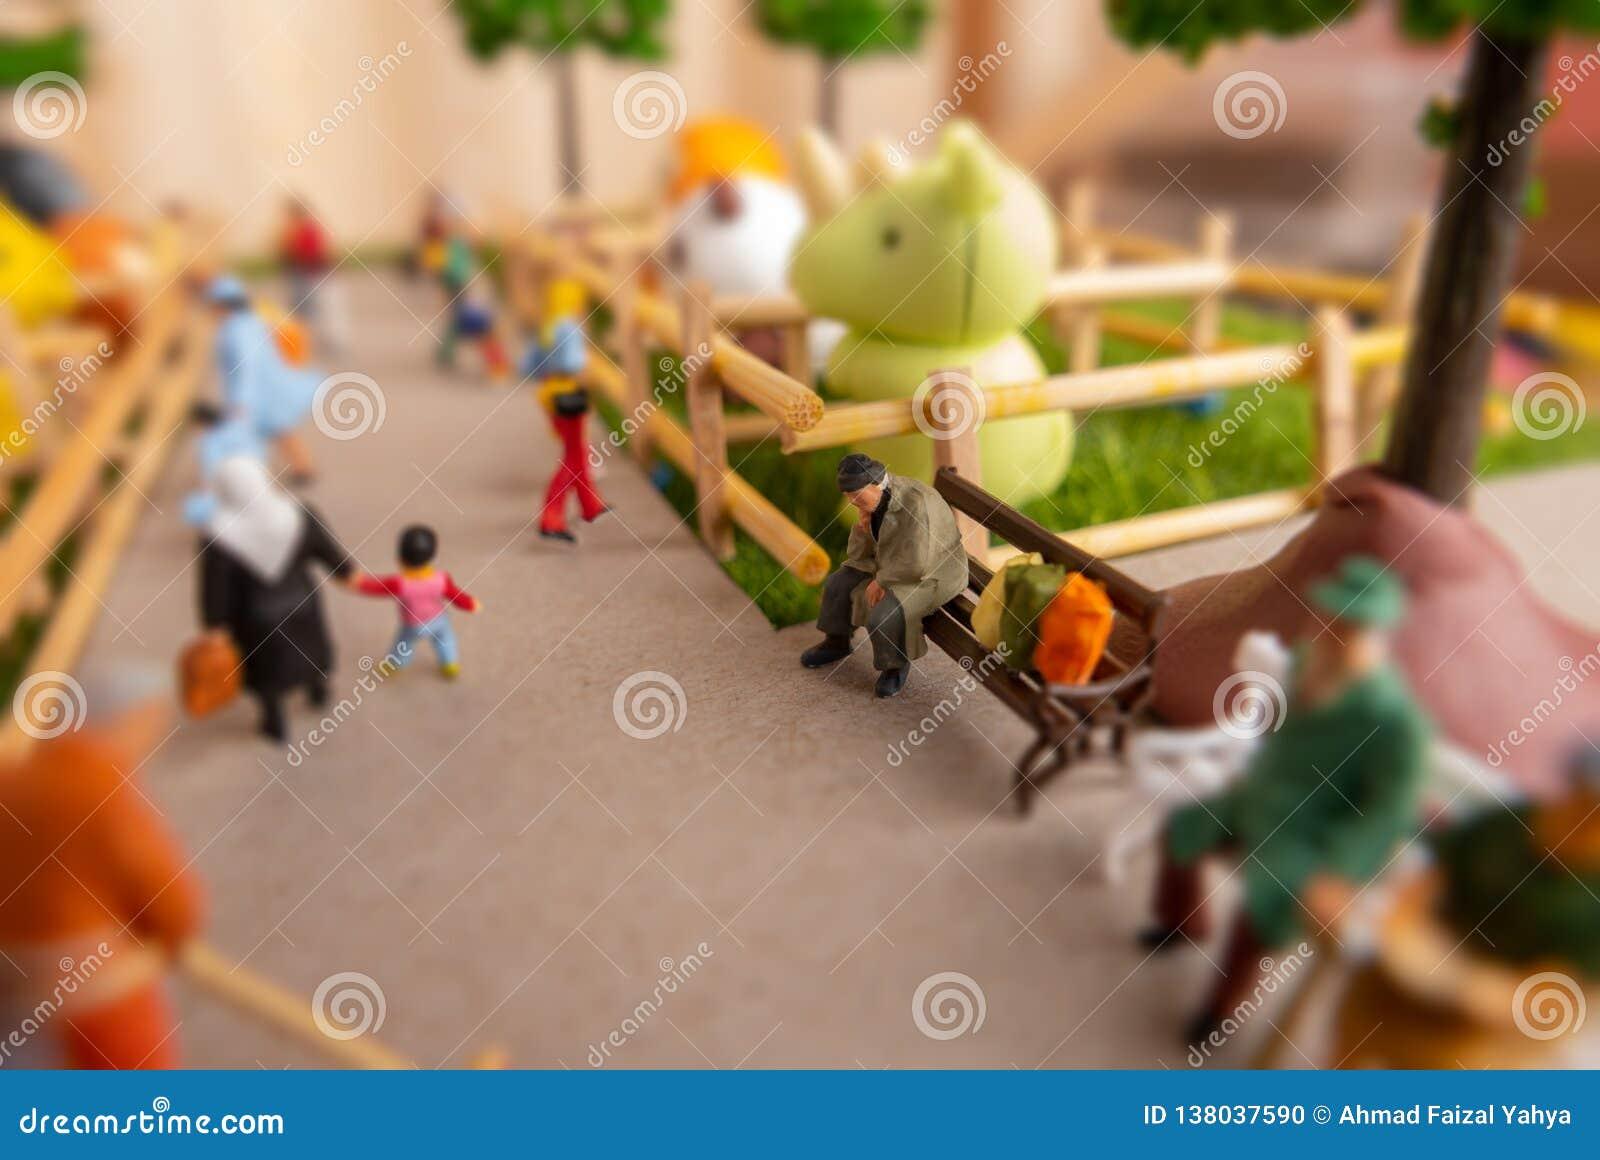 Personas miniatura de juguete